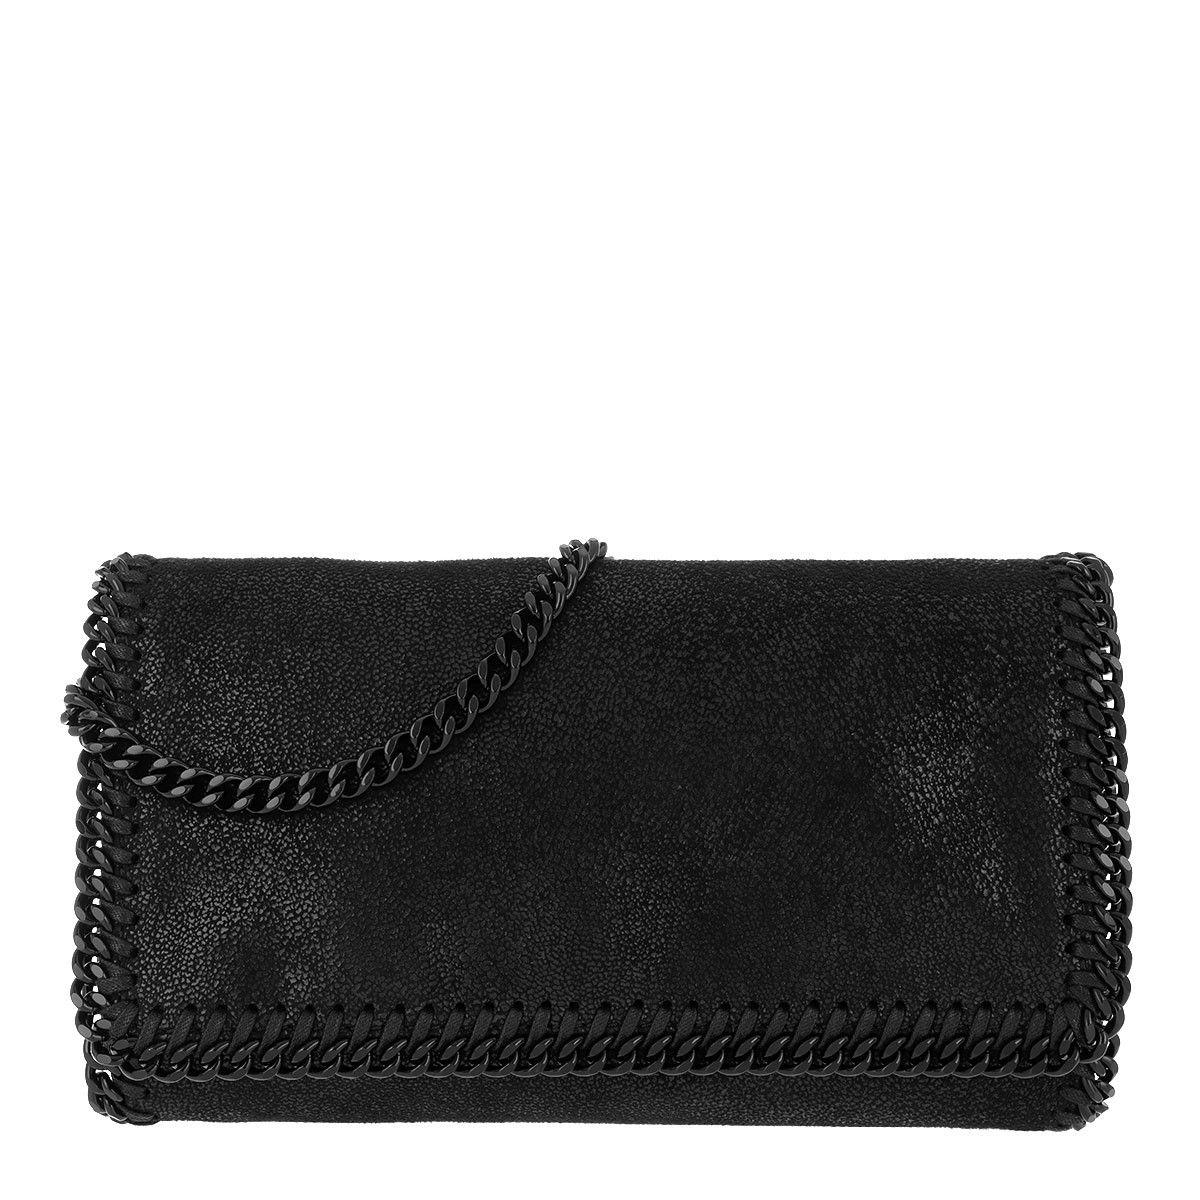 Stella McCartney Clutch - Falabella Chain Clutch Black - in schwarz - für Damen